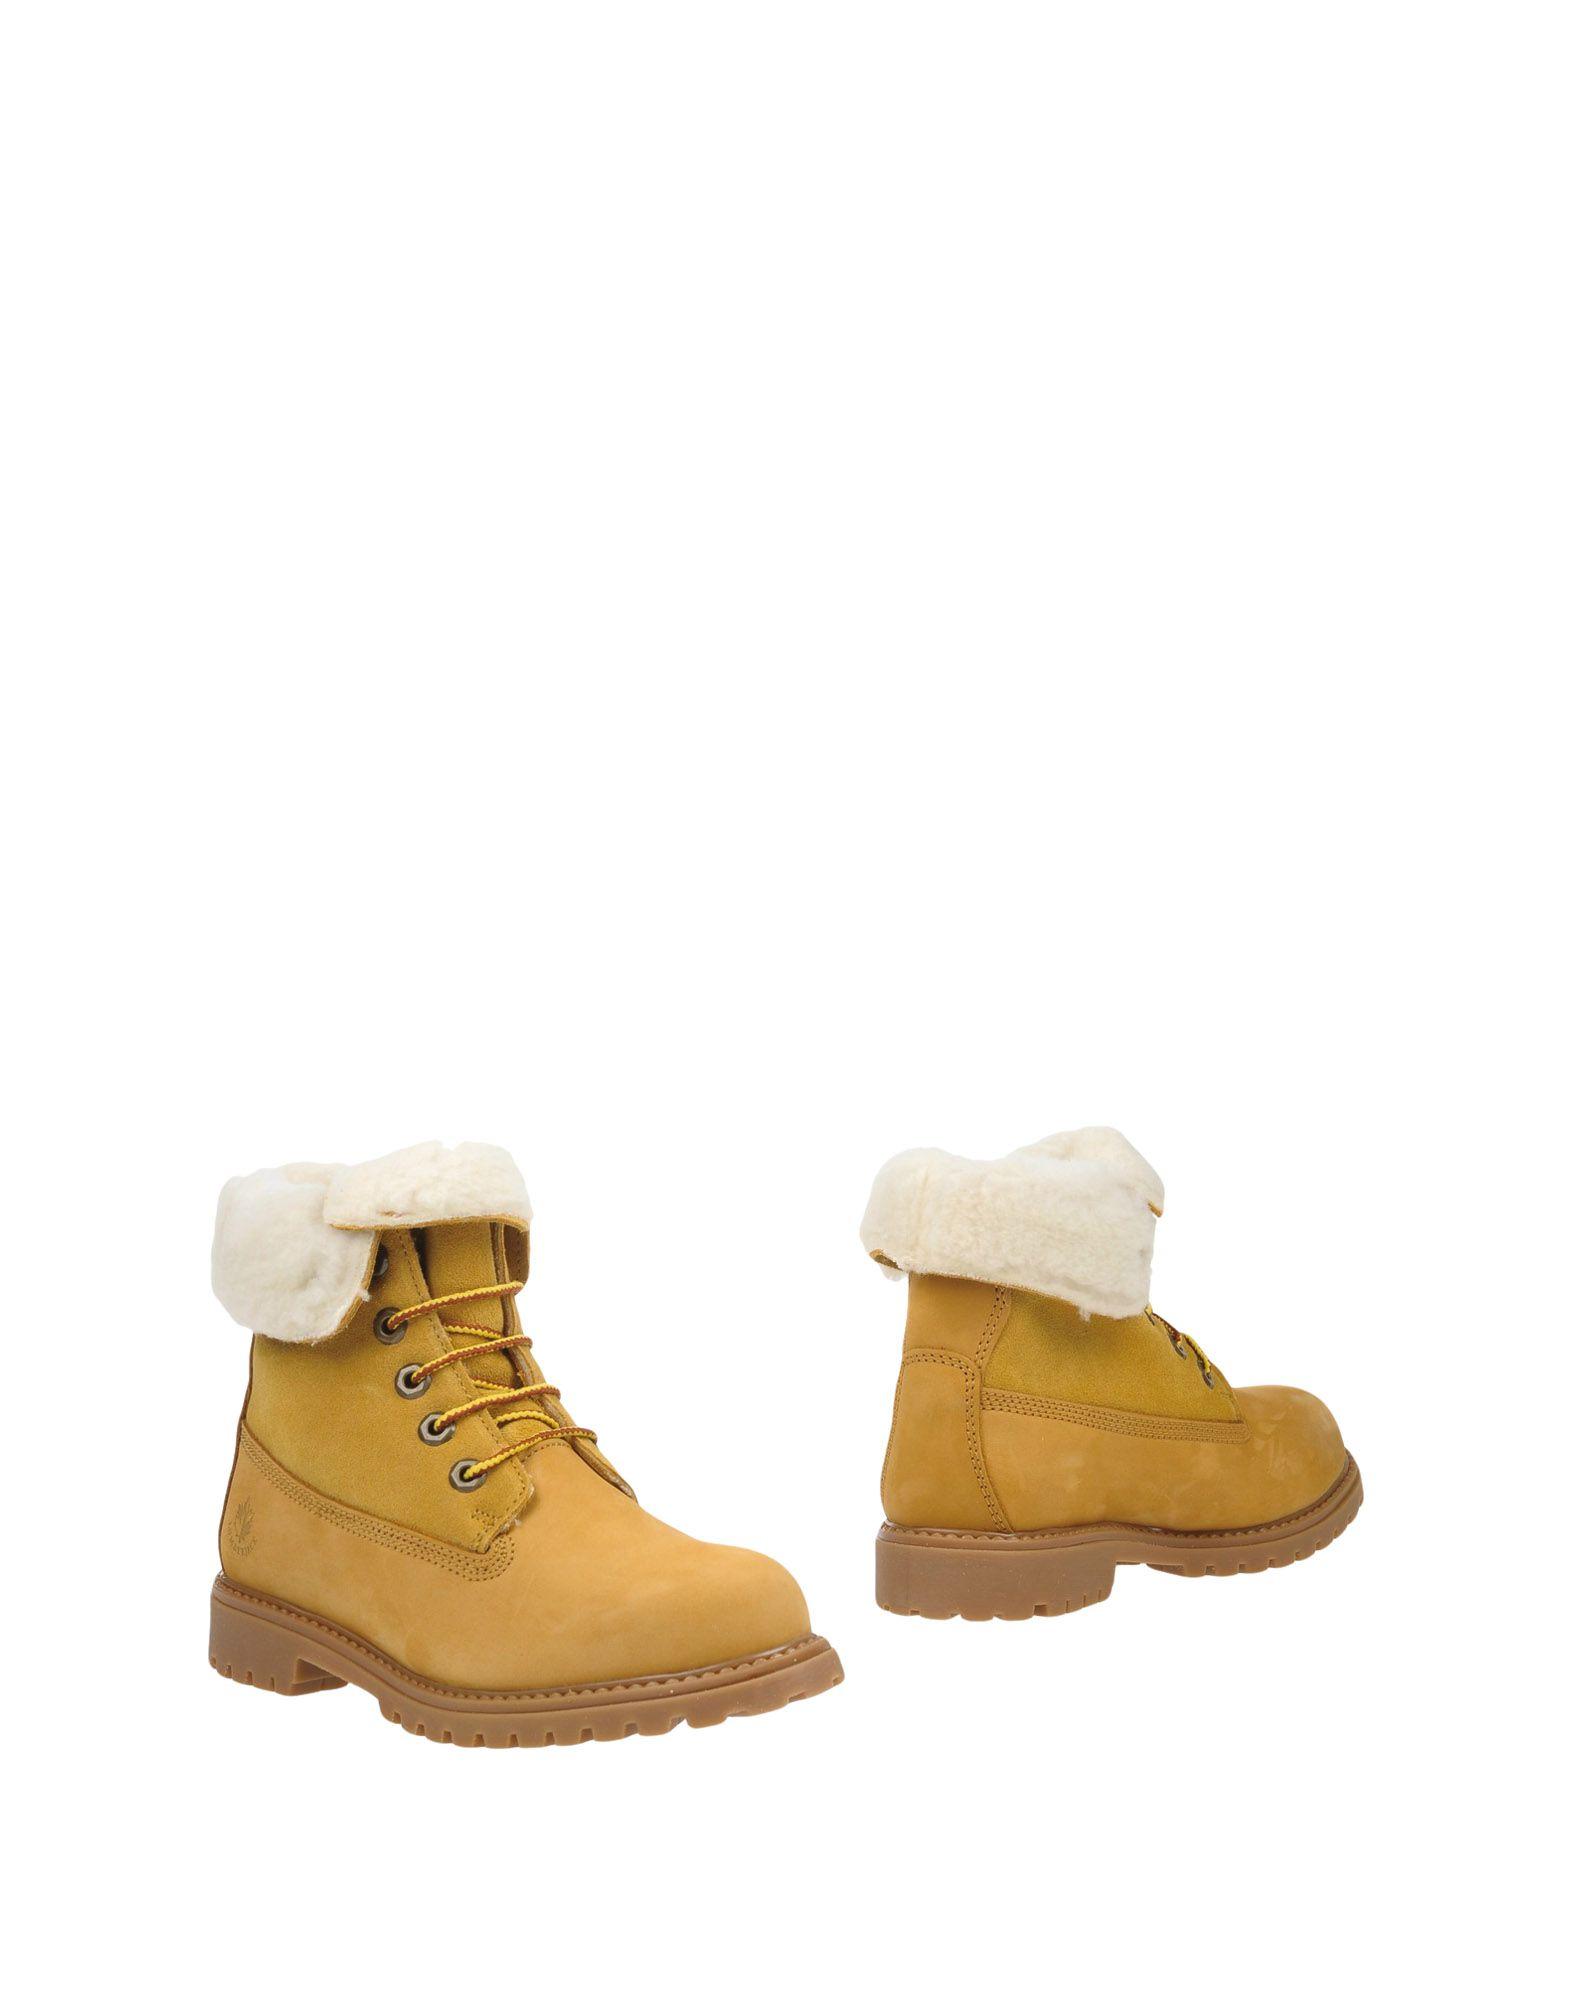 Lumberjack Stiefelette Damen  11320853QK Gute Qualität beliebte Schuhe